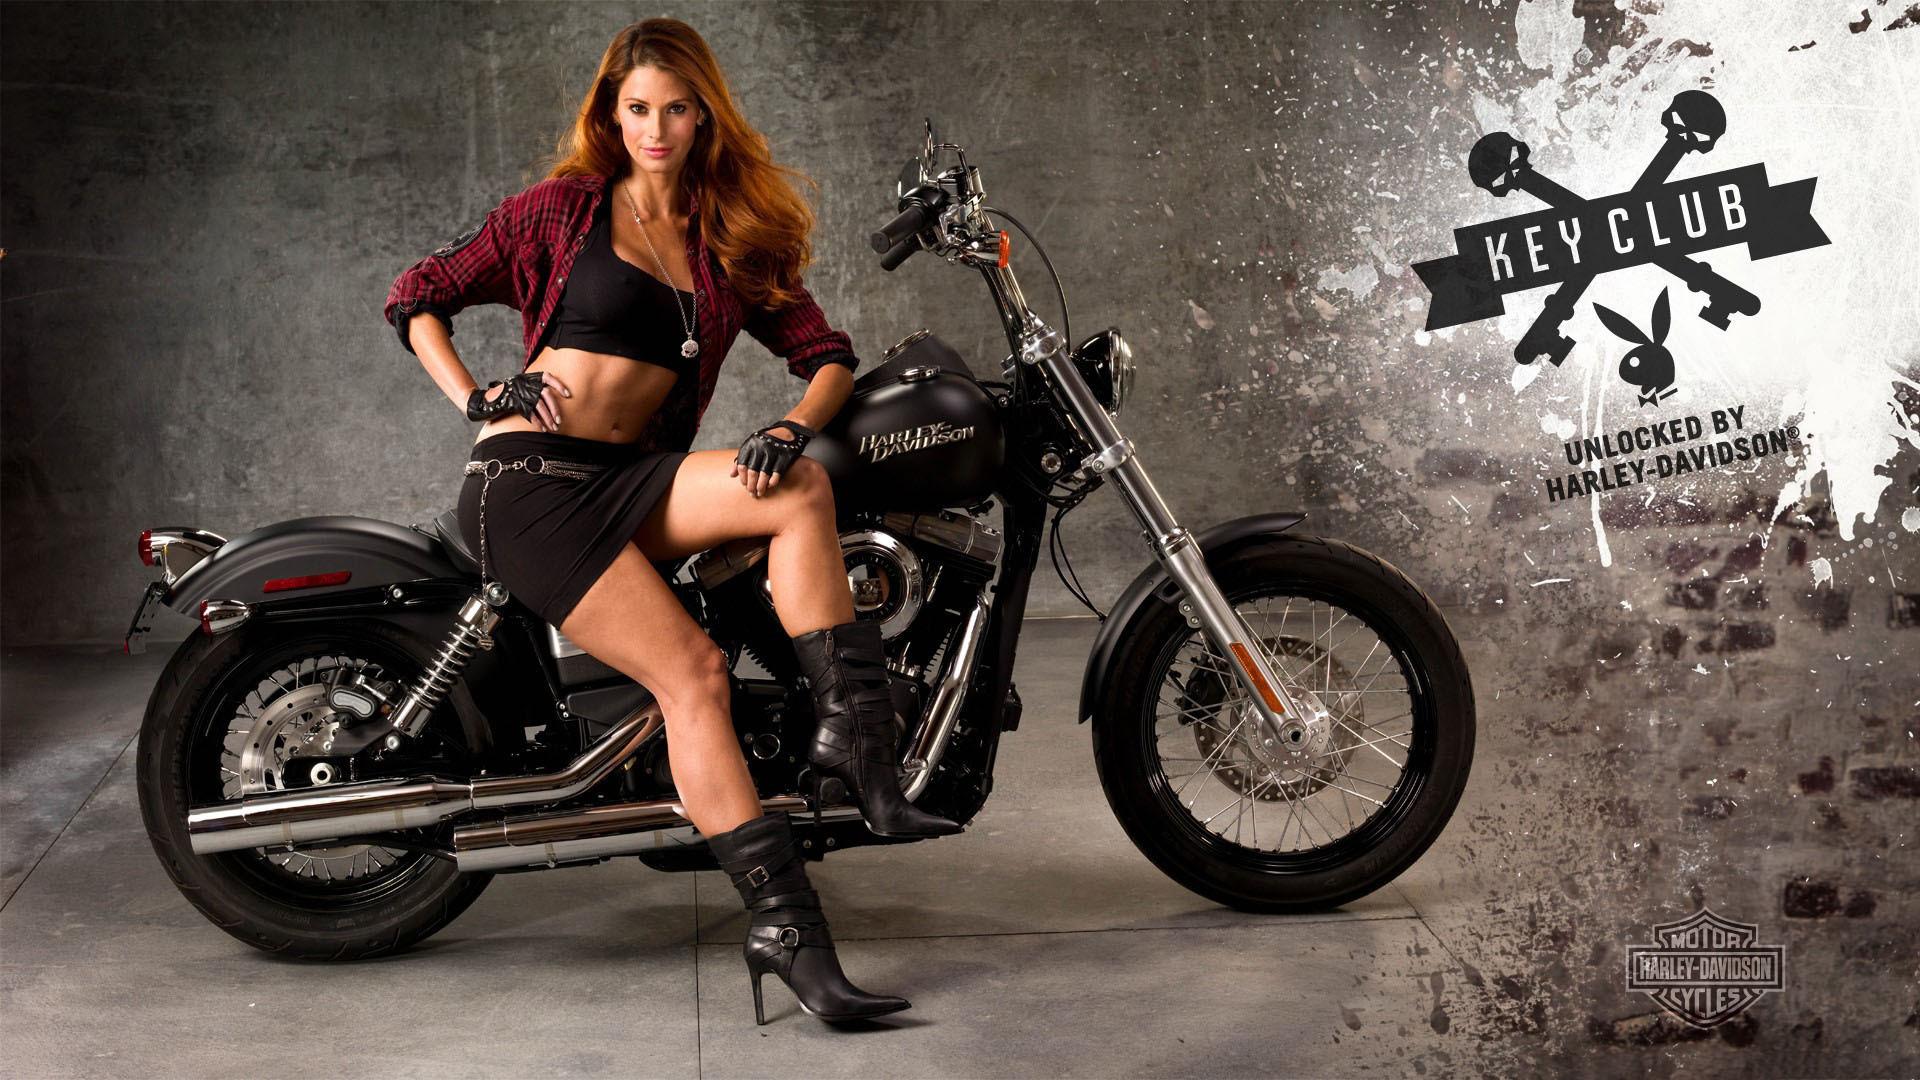 Moto Girl Pin Up Motorcycle Wallpaper